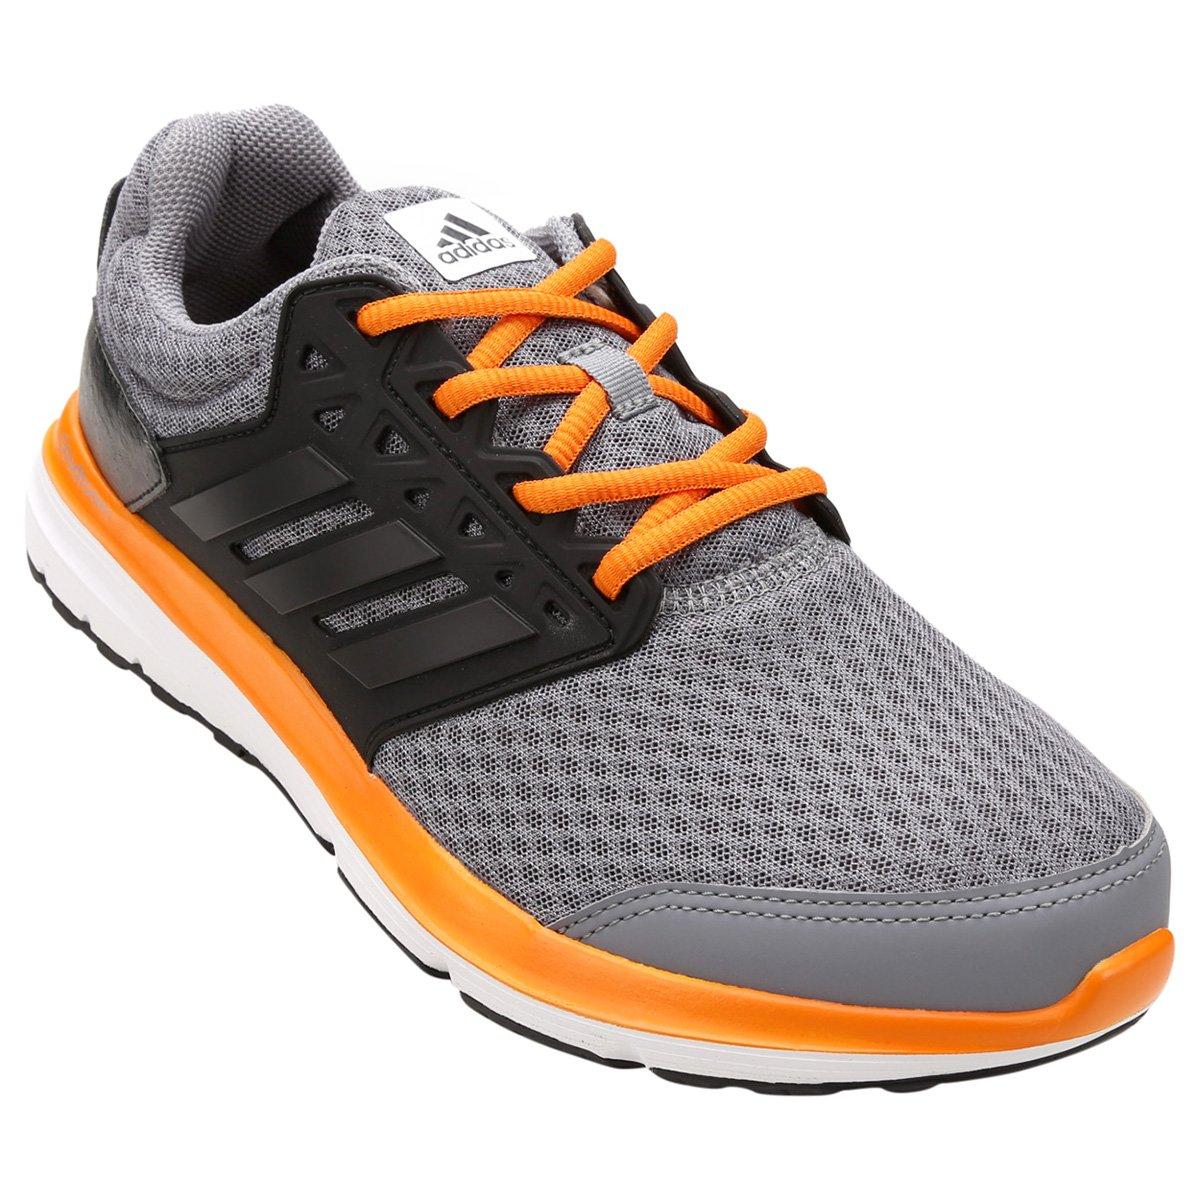 51f30be5c Tênis Adidas Galaxy 3.1 Masculino - Compre Agora